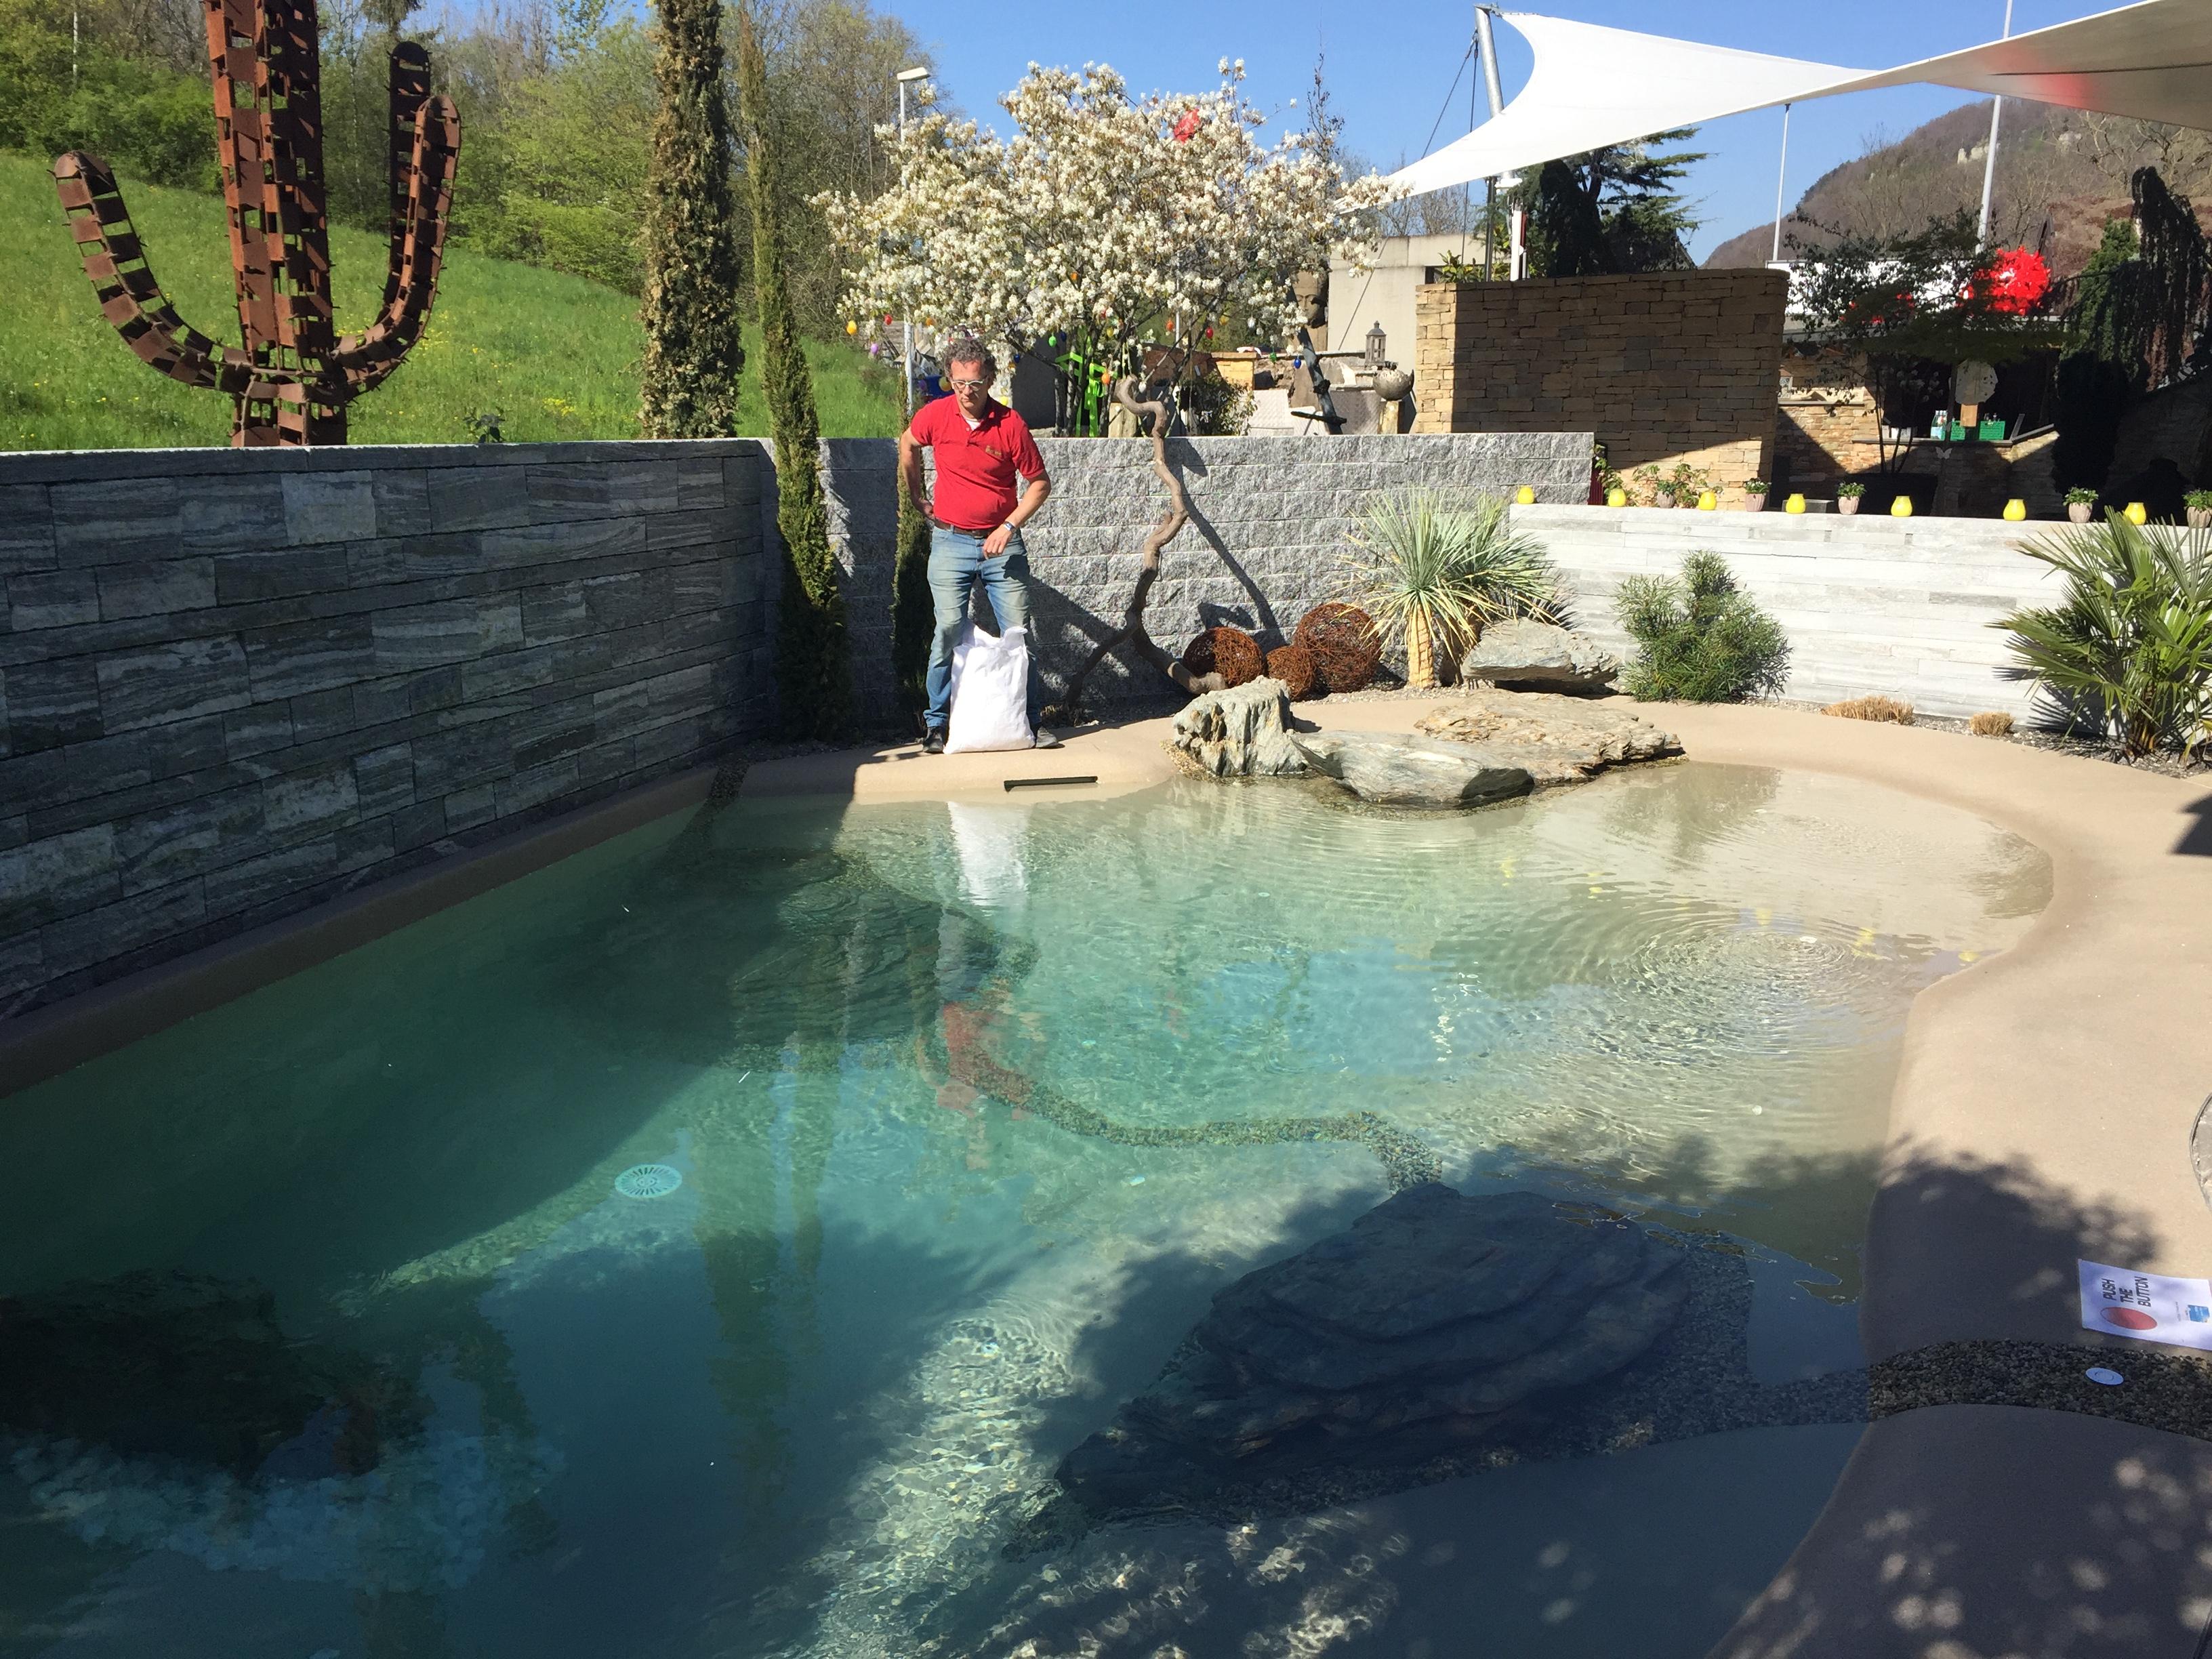 Halitkristalle werden in den Pool gegeben